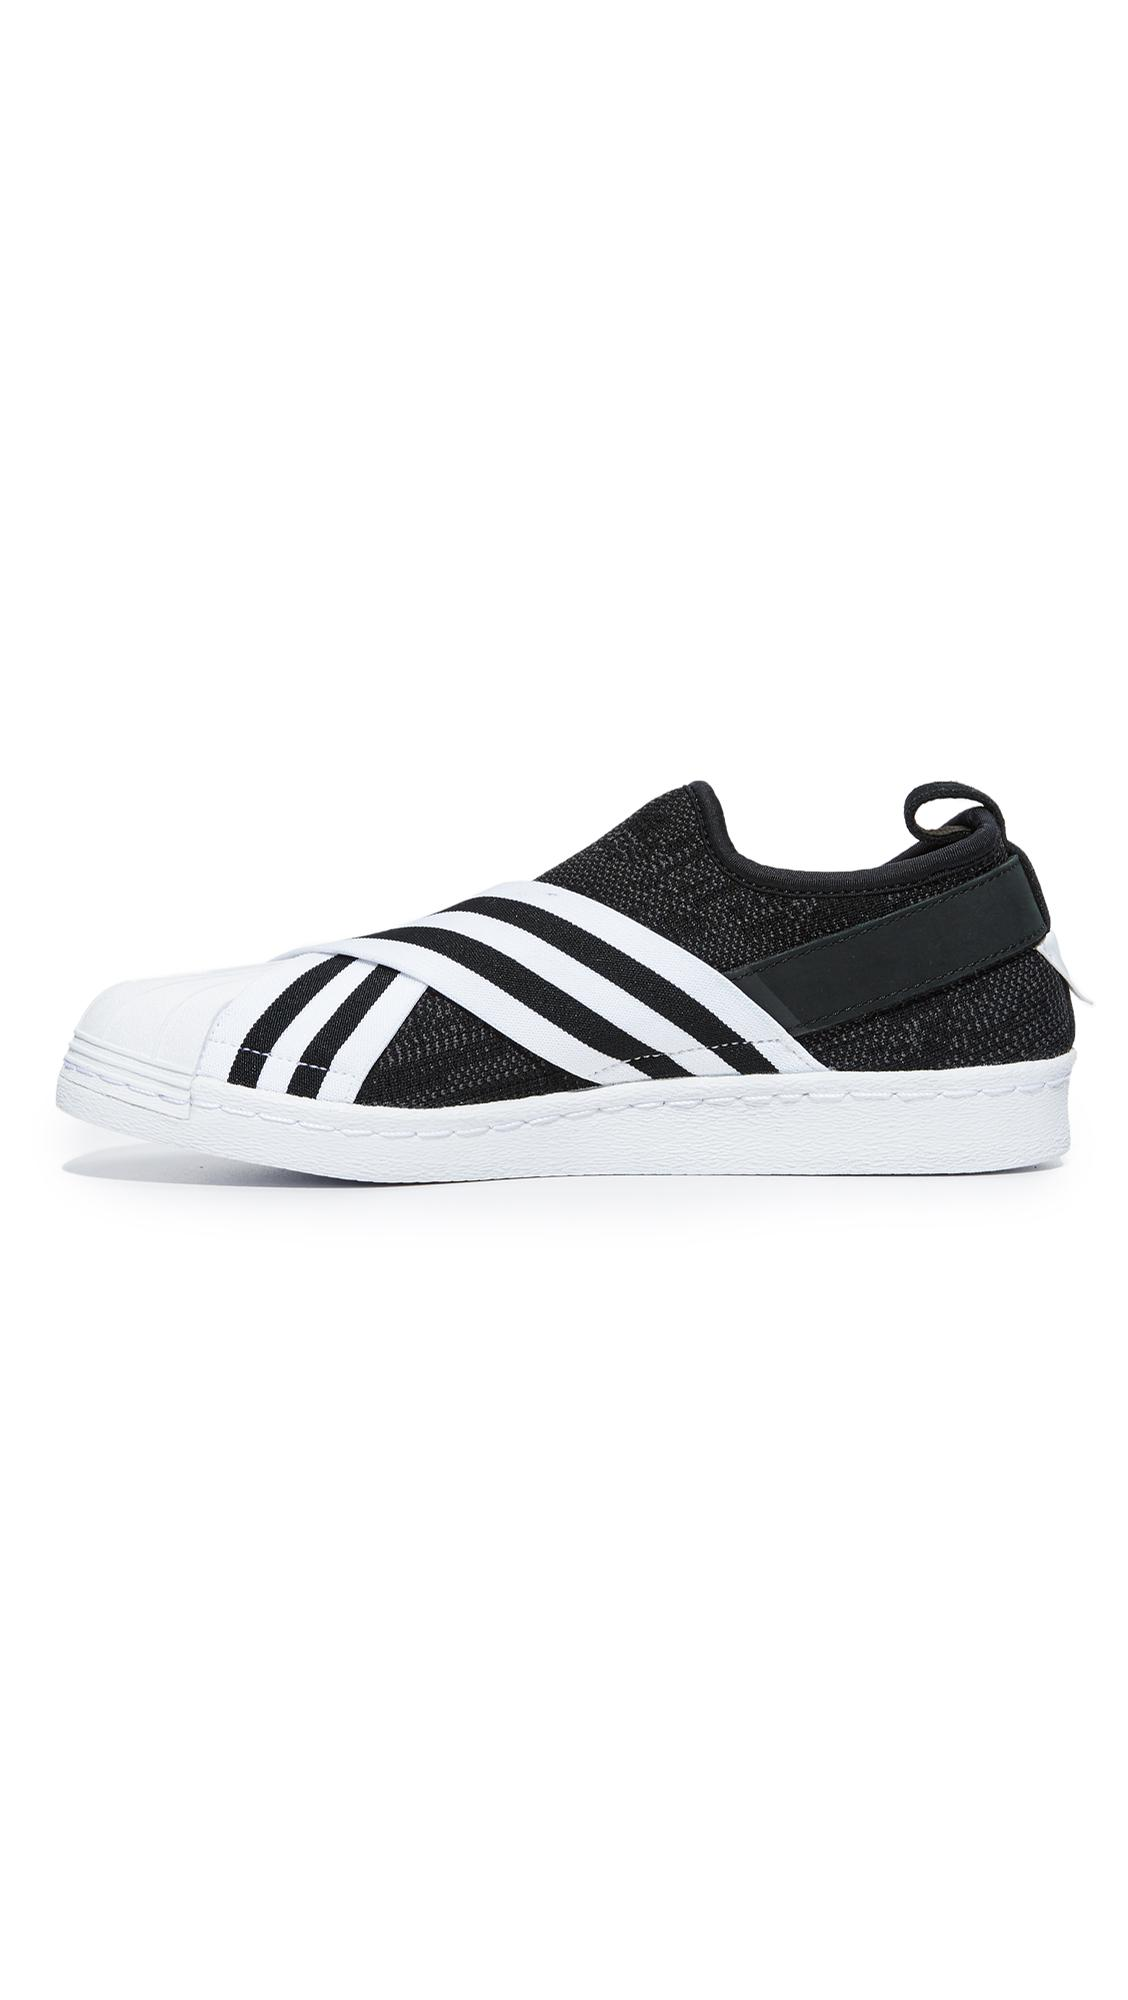 60771b752fd9 white mountaineering x adidas originals superstar sneakers black